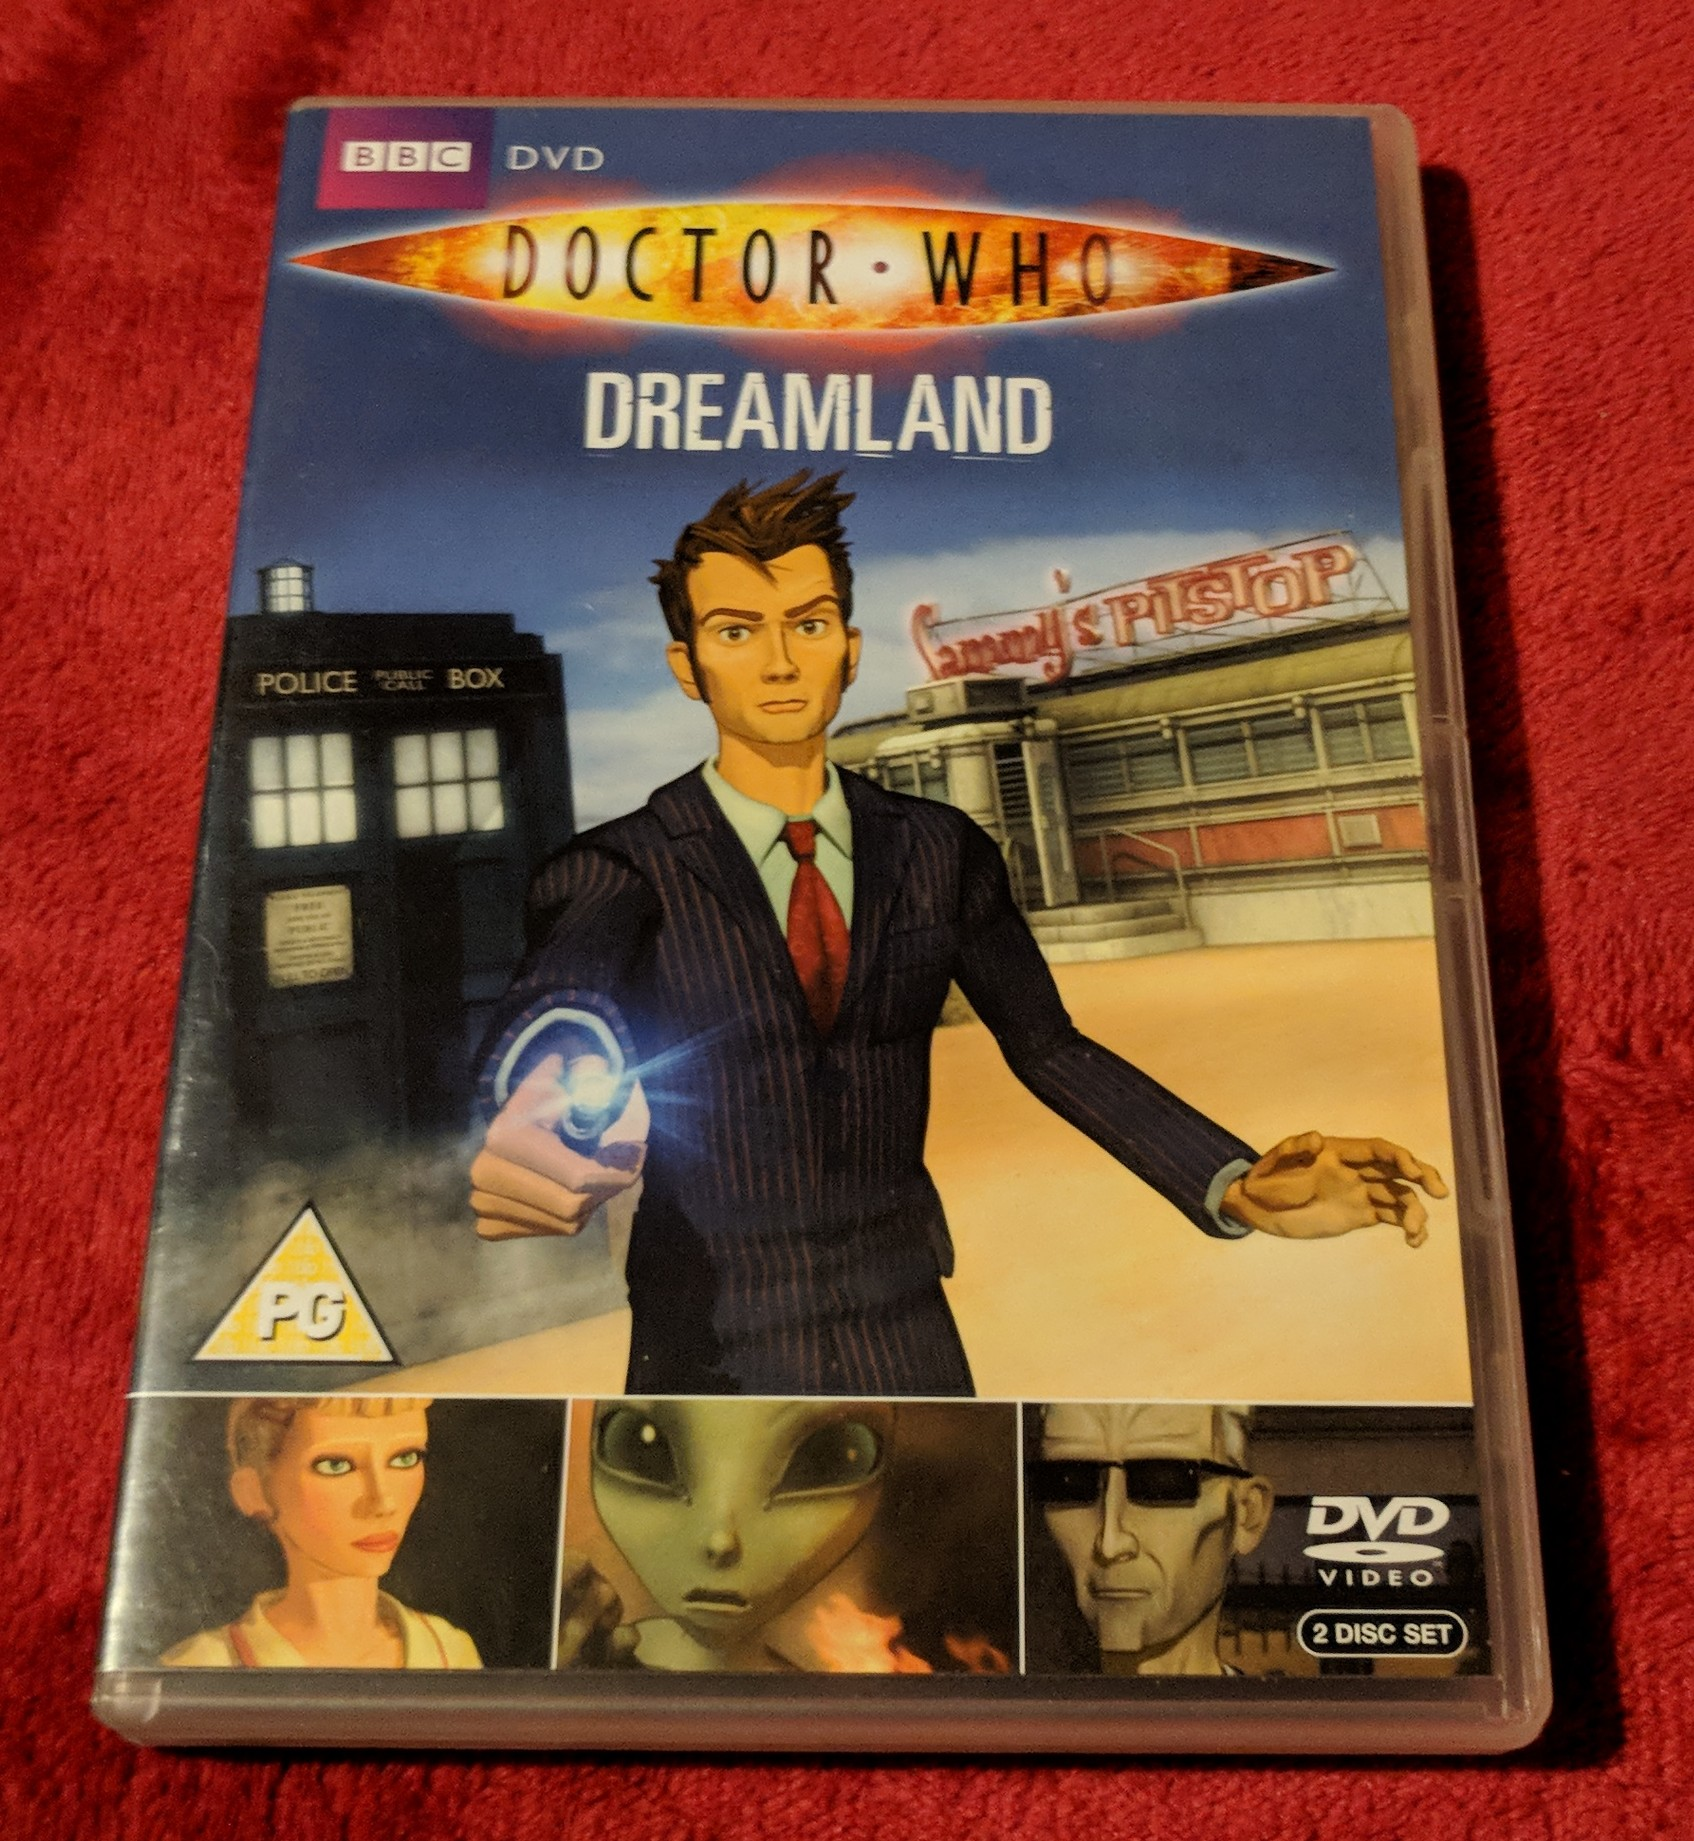 Doctor Who - Dreamland